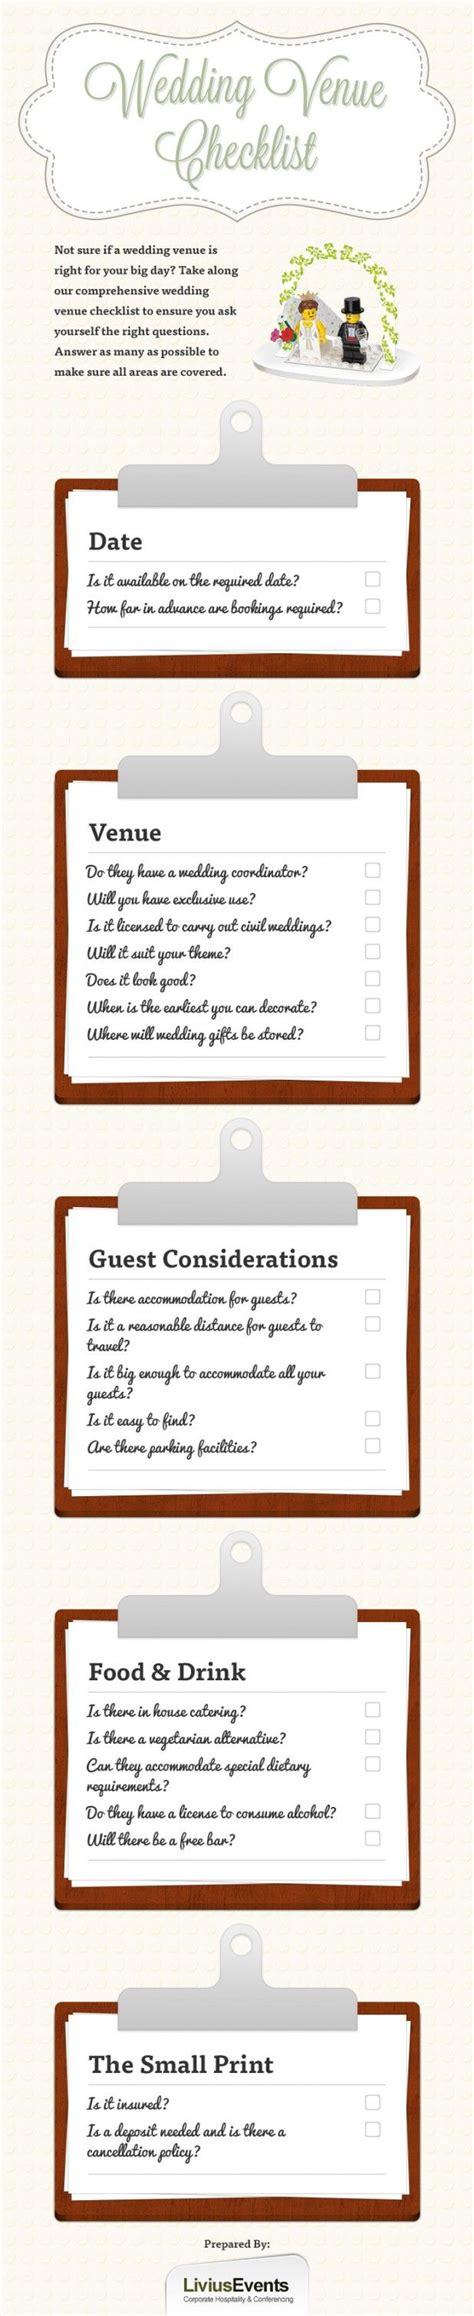 Wedding Checklist Venue by Wedding Venue Checklist Wedding Thoughts